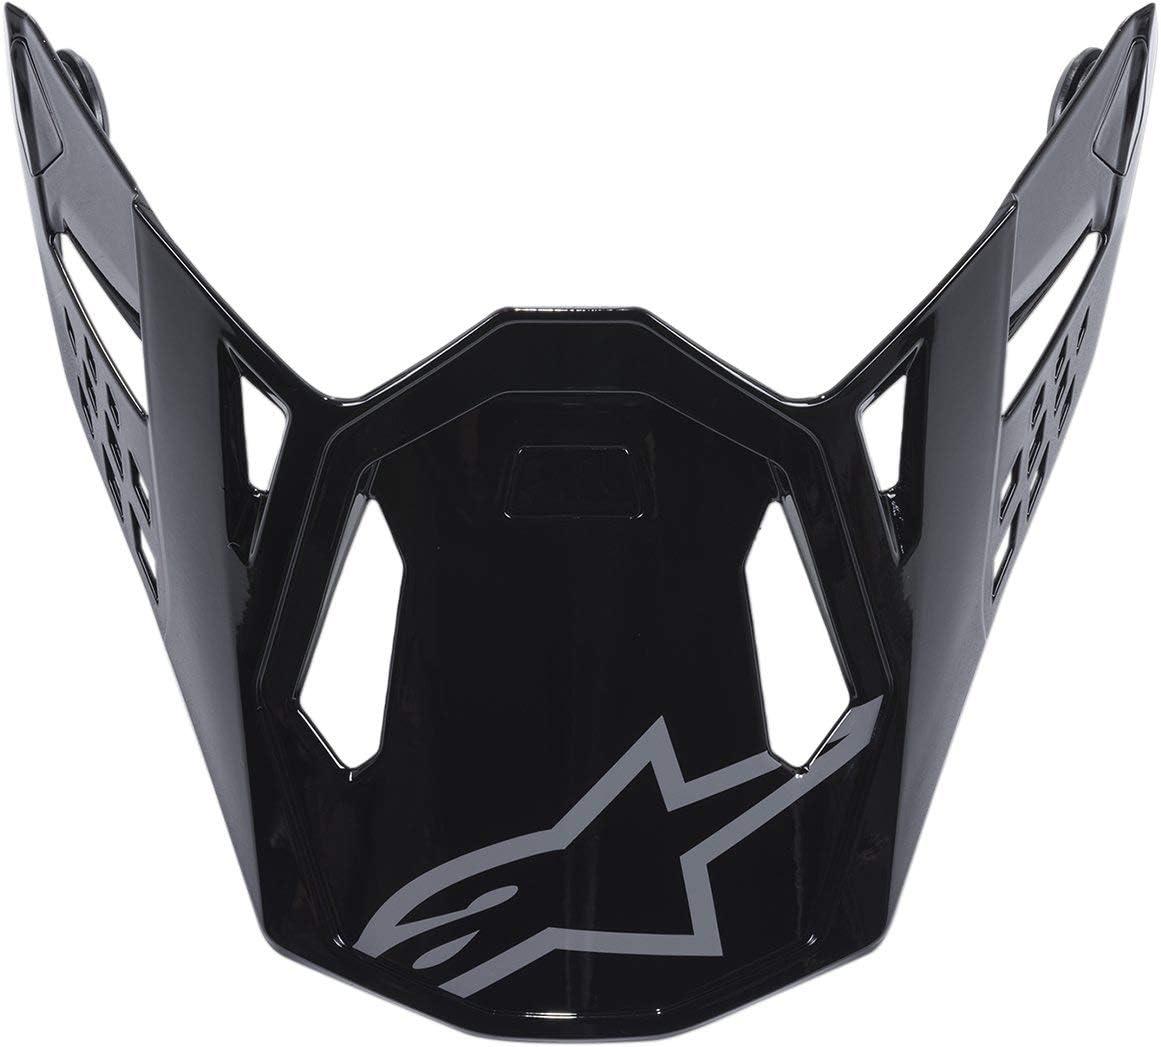 Alpinestars Supertech M8 Import Radium Off-Road Visor Helmet Motorcycle Quantity limited